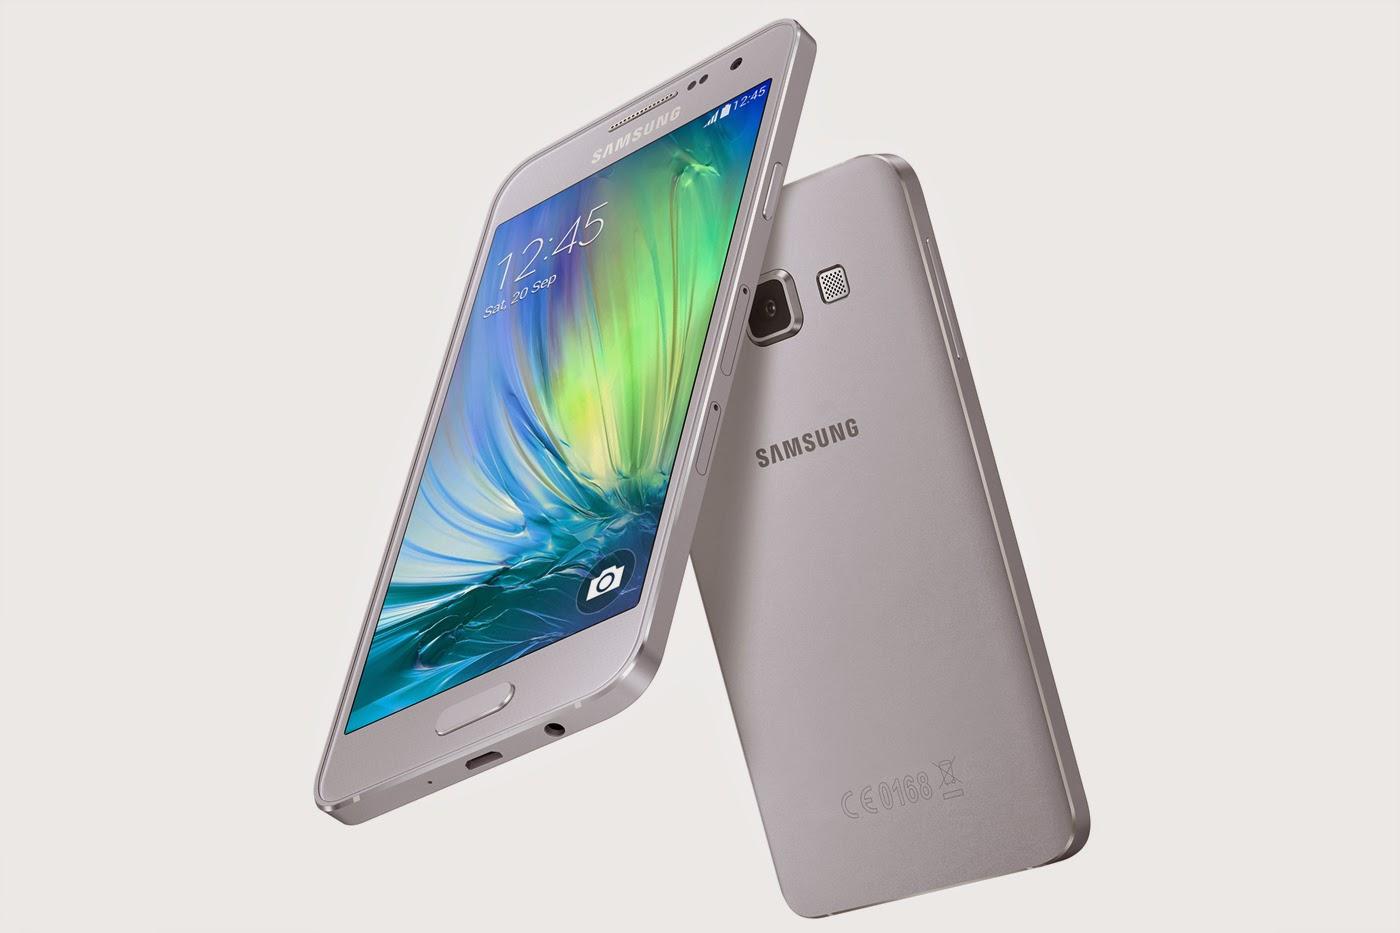 Geekschicksten Samsung Galaxy Grand Prime Quad Core 12 Ghz Processor 8 Mp Camera Android Kitkat Ready A3